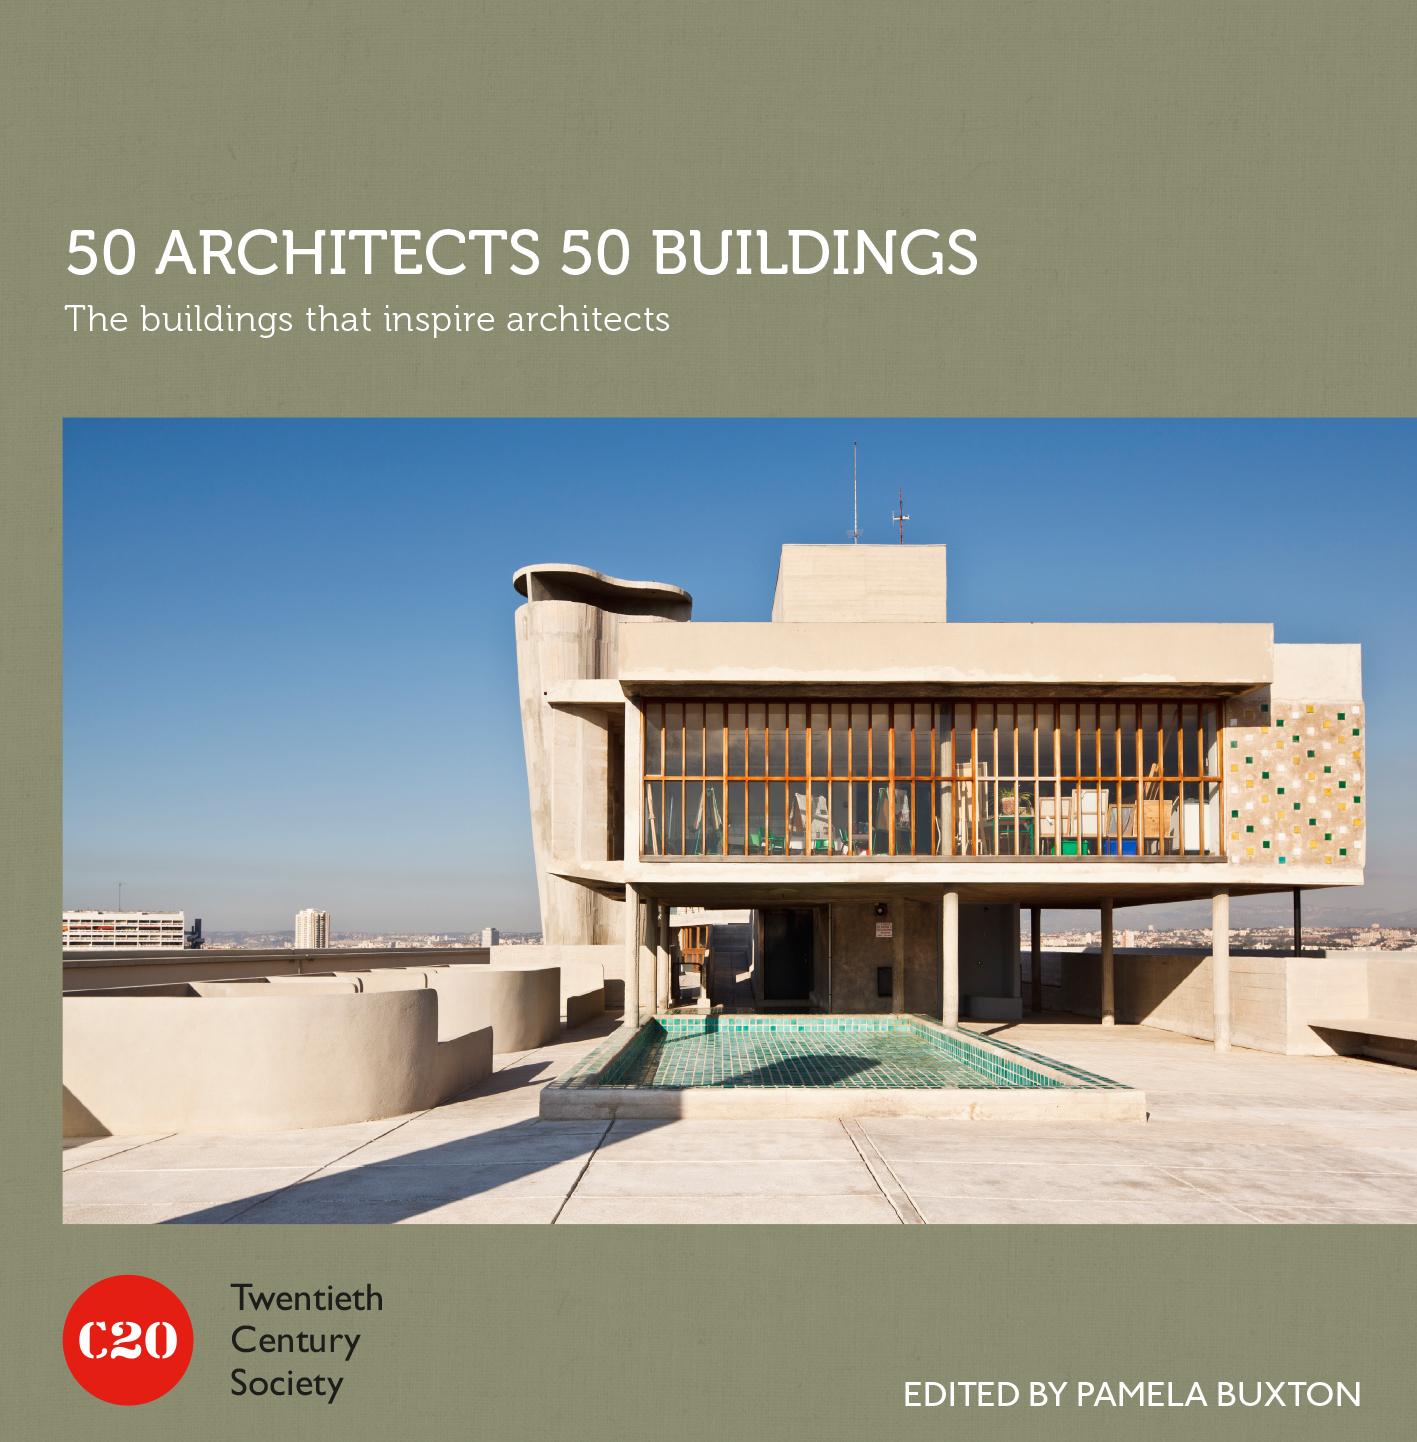 20Th Century Architects books — the twentieth century society